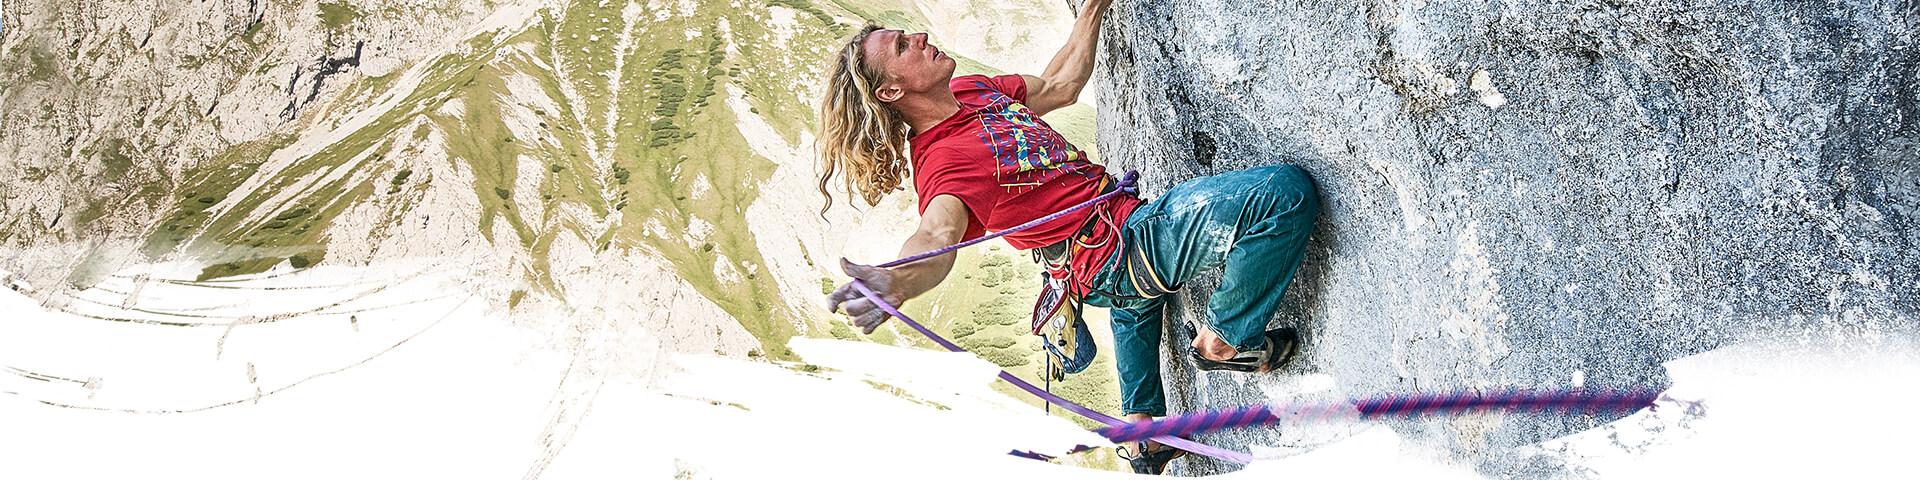 Picture of MAXIM athlete Mich Kemeter